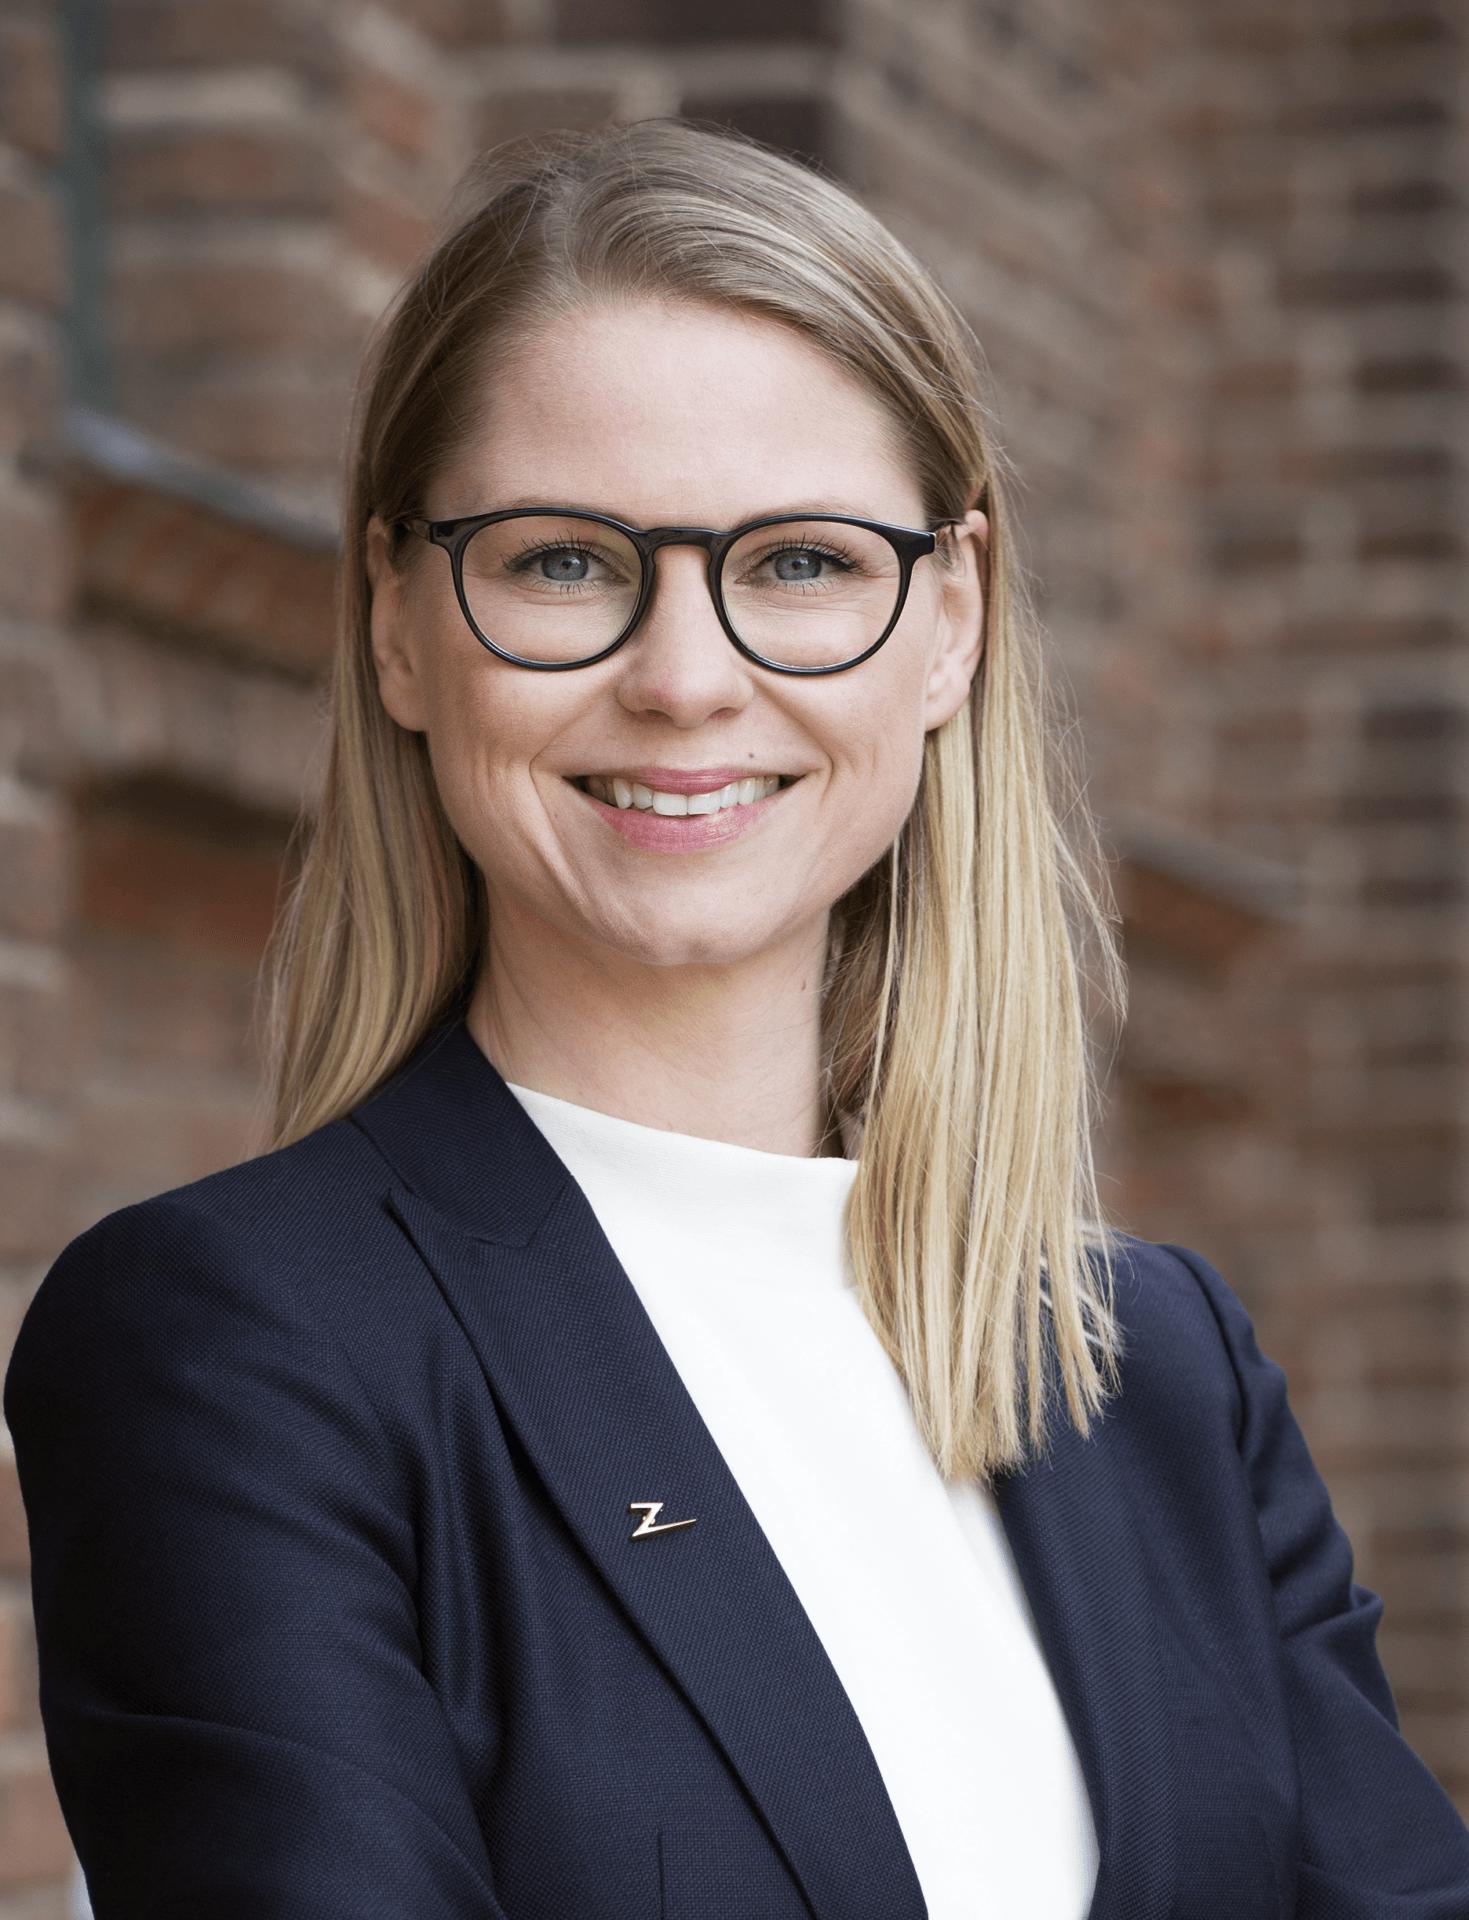 Anna-Karin Andersen